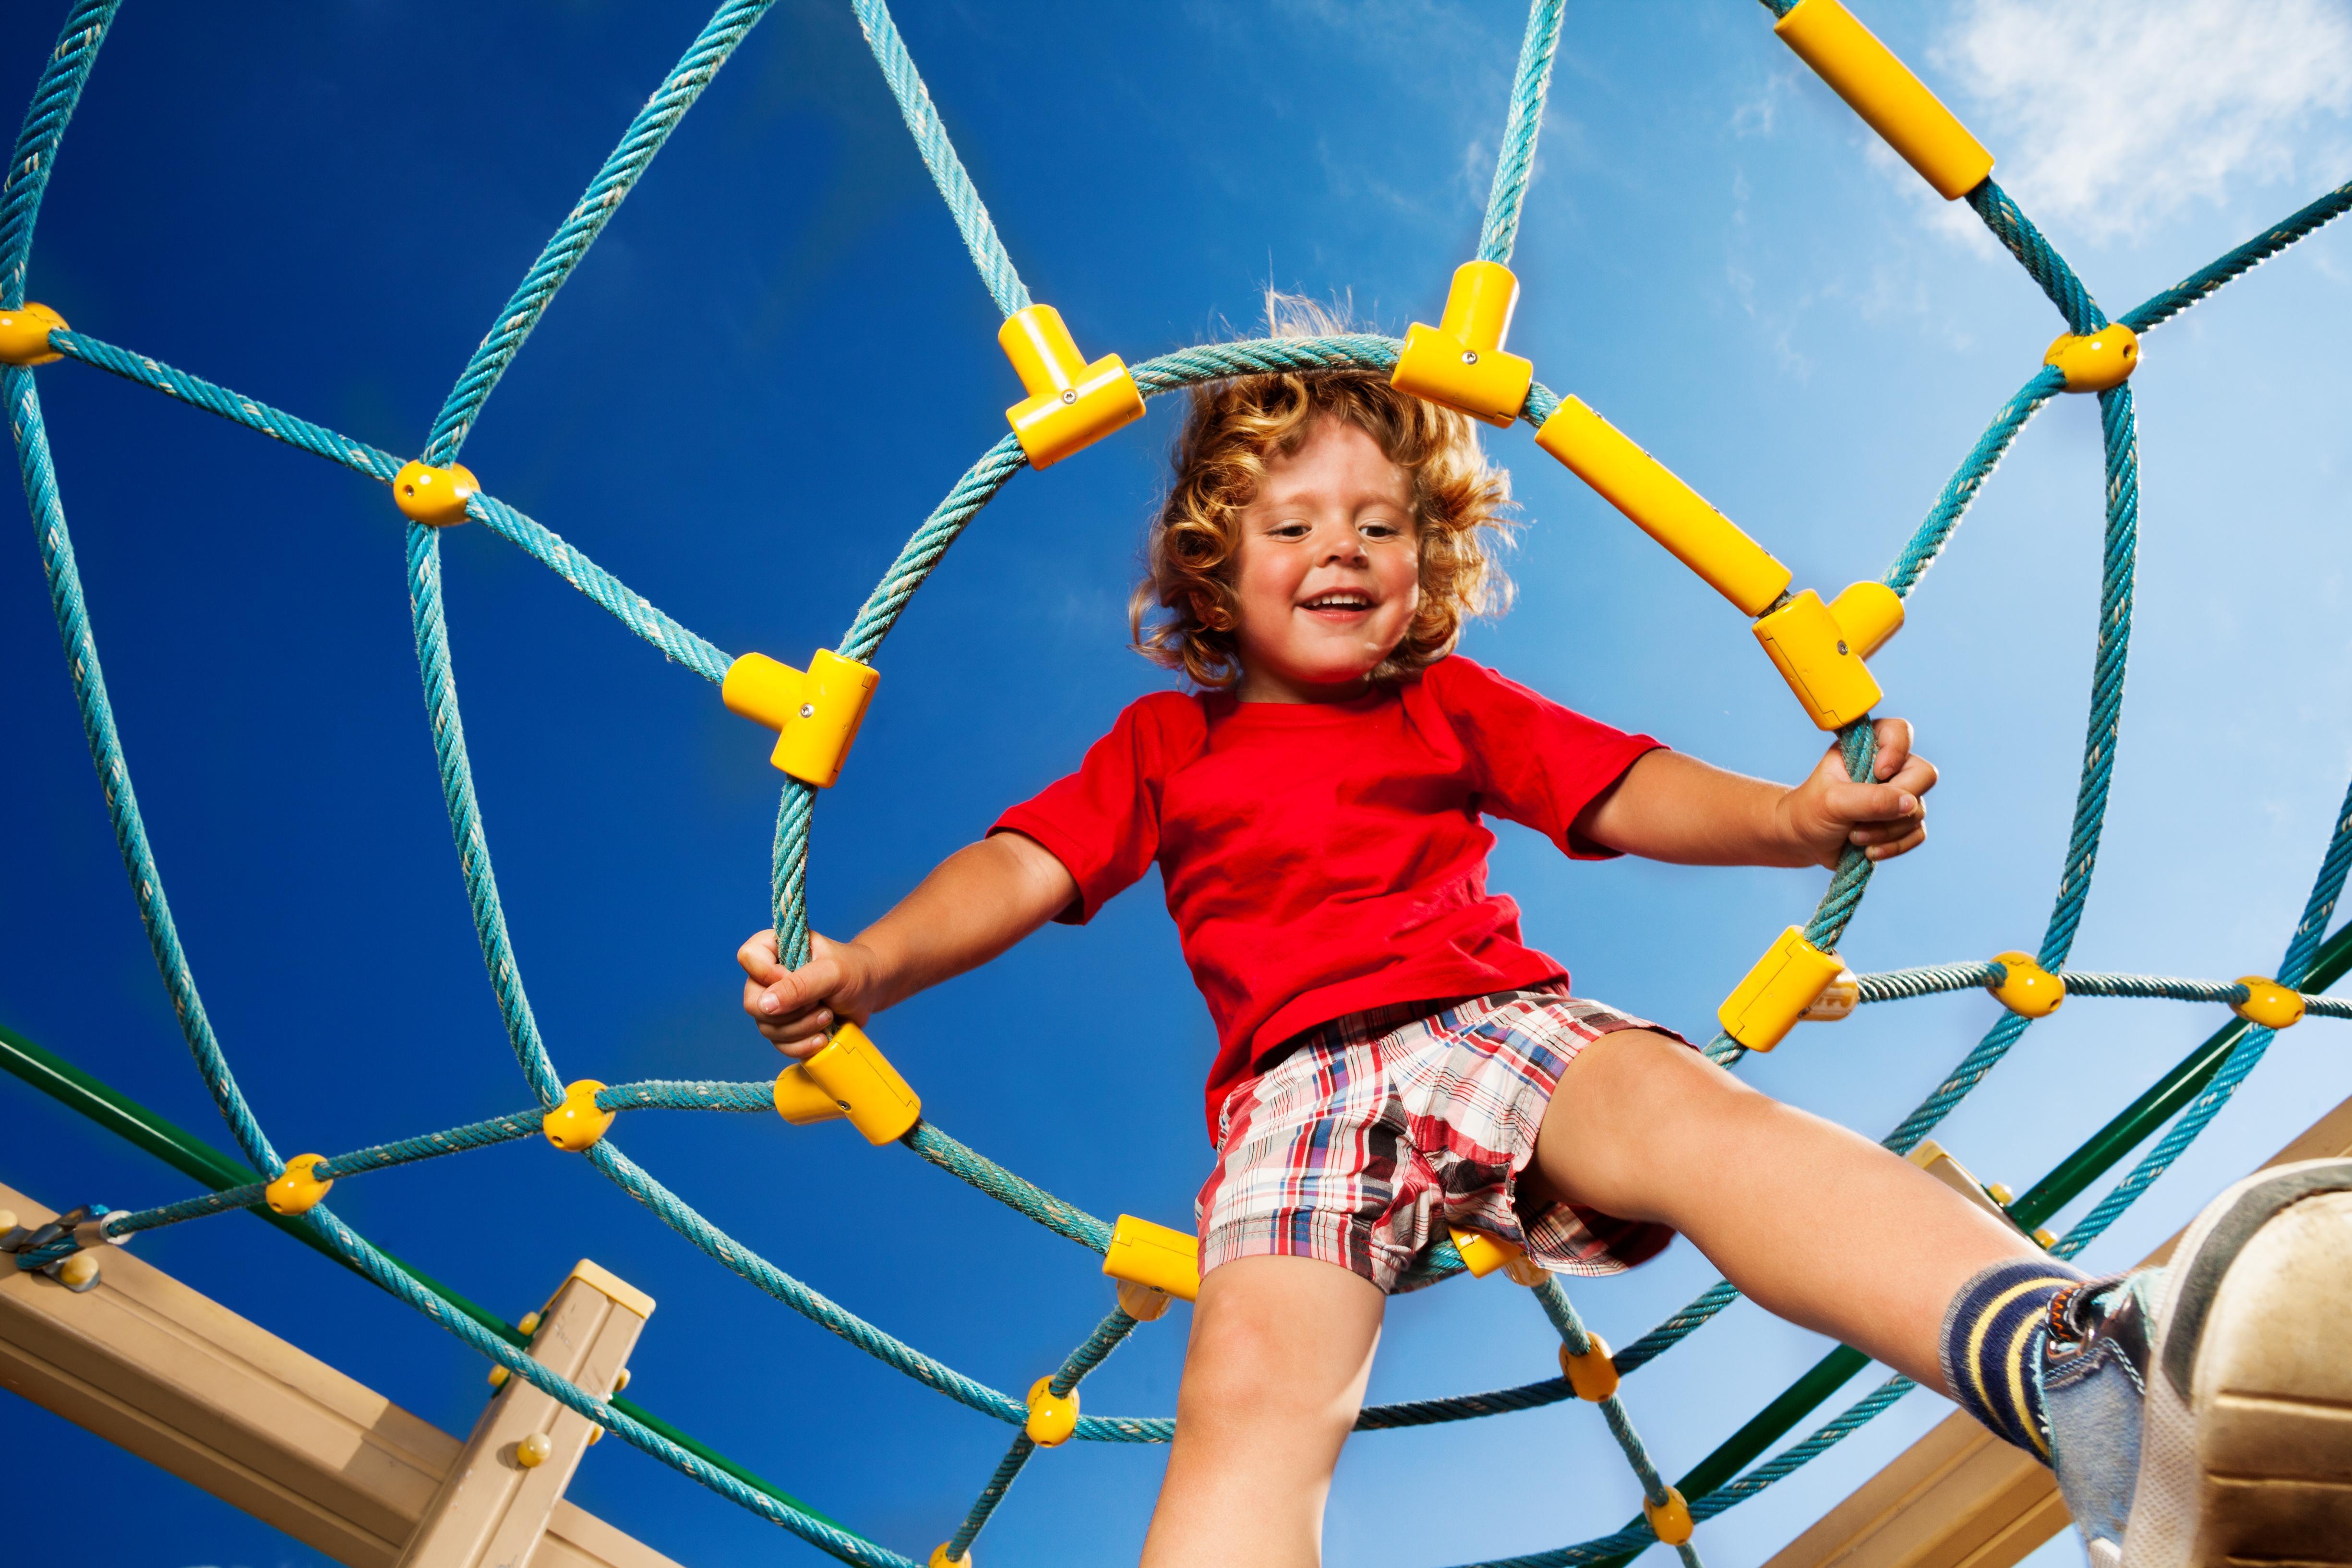 kids risky play, risky play for kids, risky play benefits